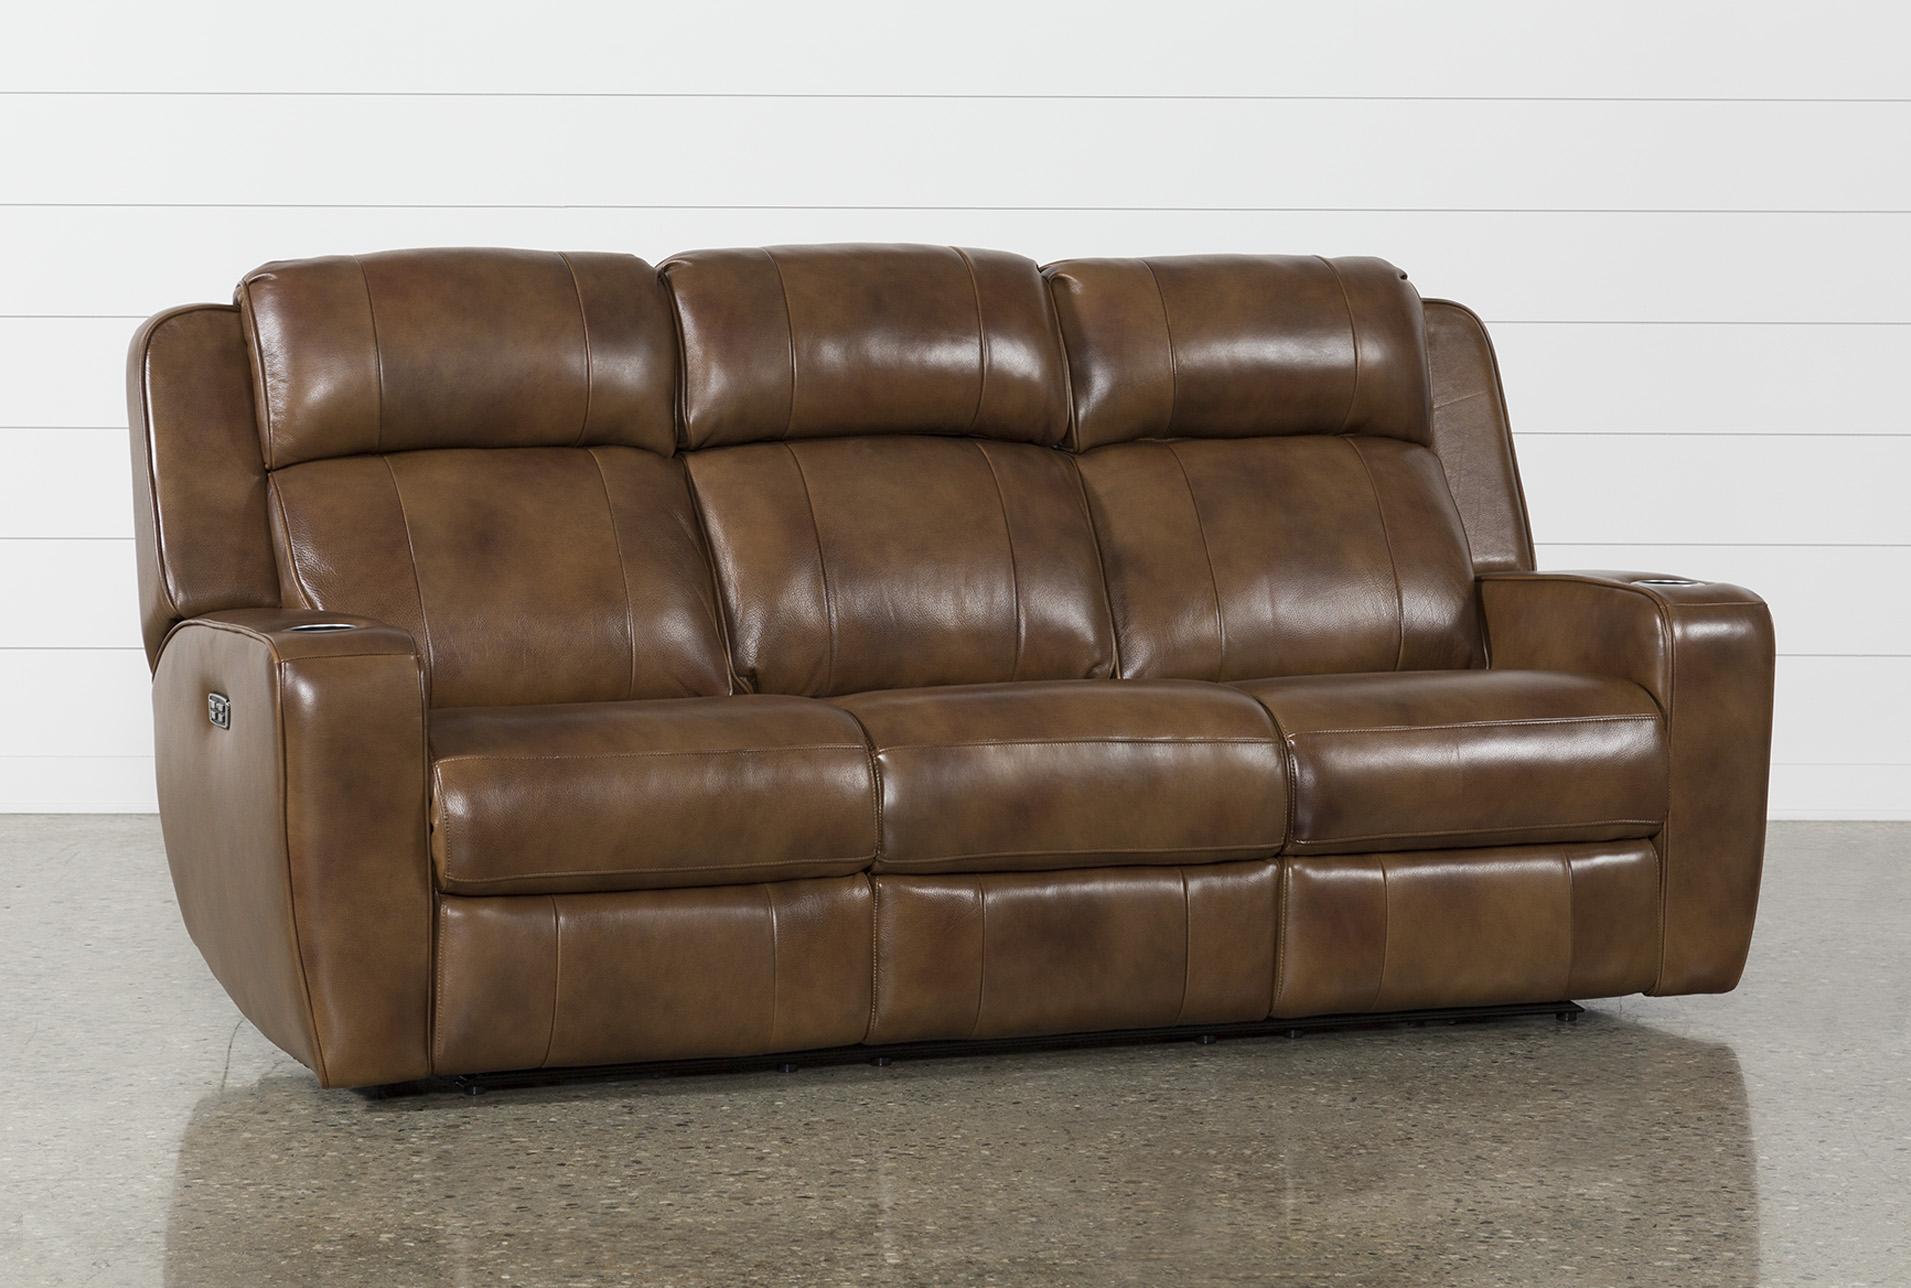 phelps leather power reclining sofa w power headrest usb living rh livingspaces com leather power reclining sofa costco leather power reclining sofa costco